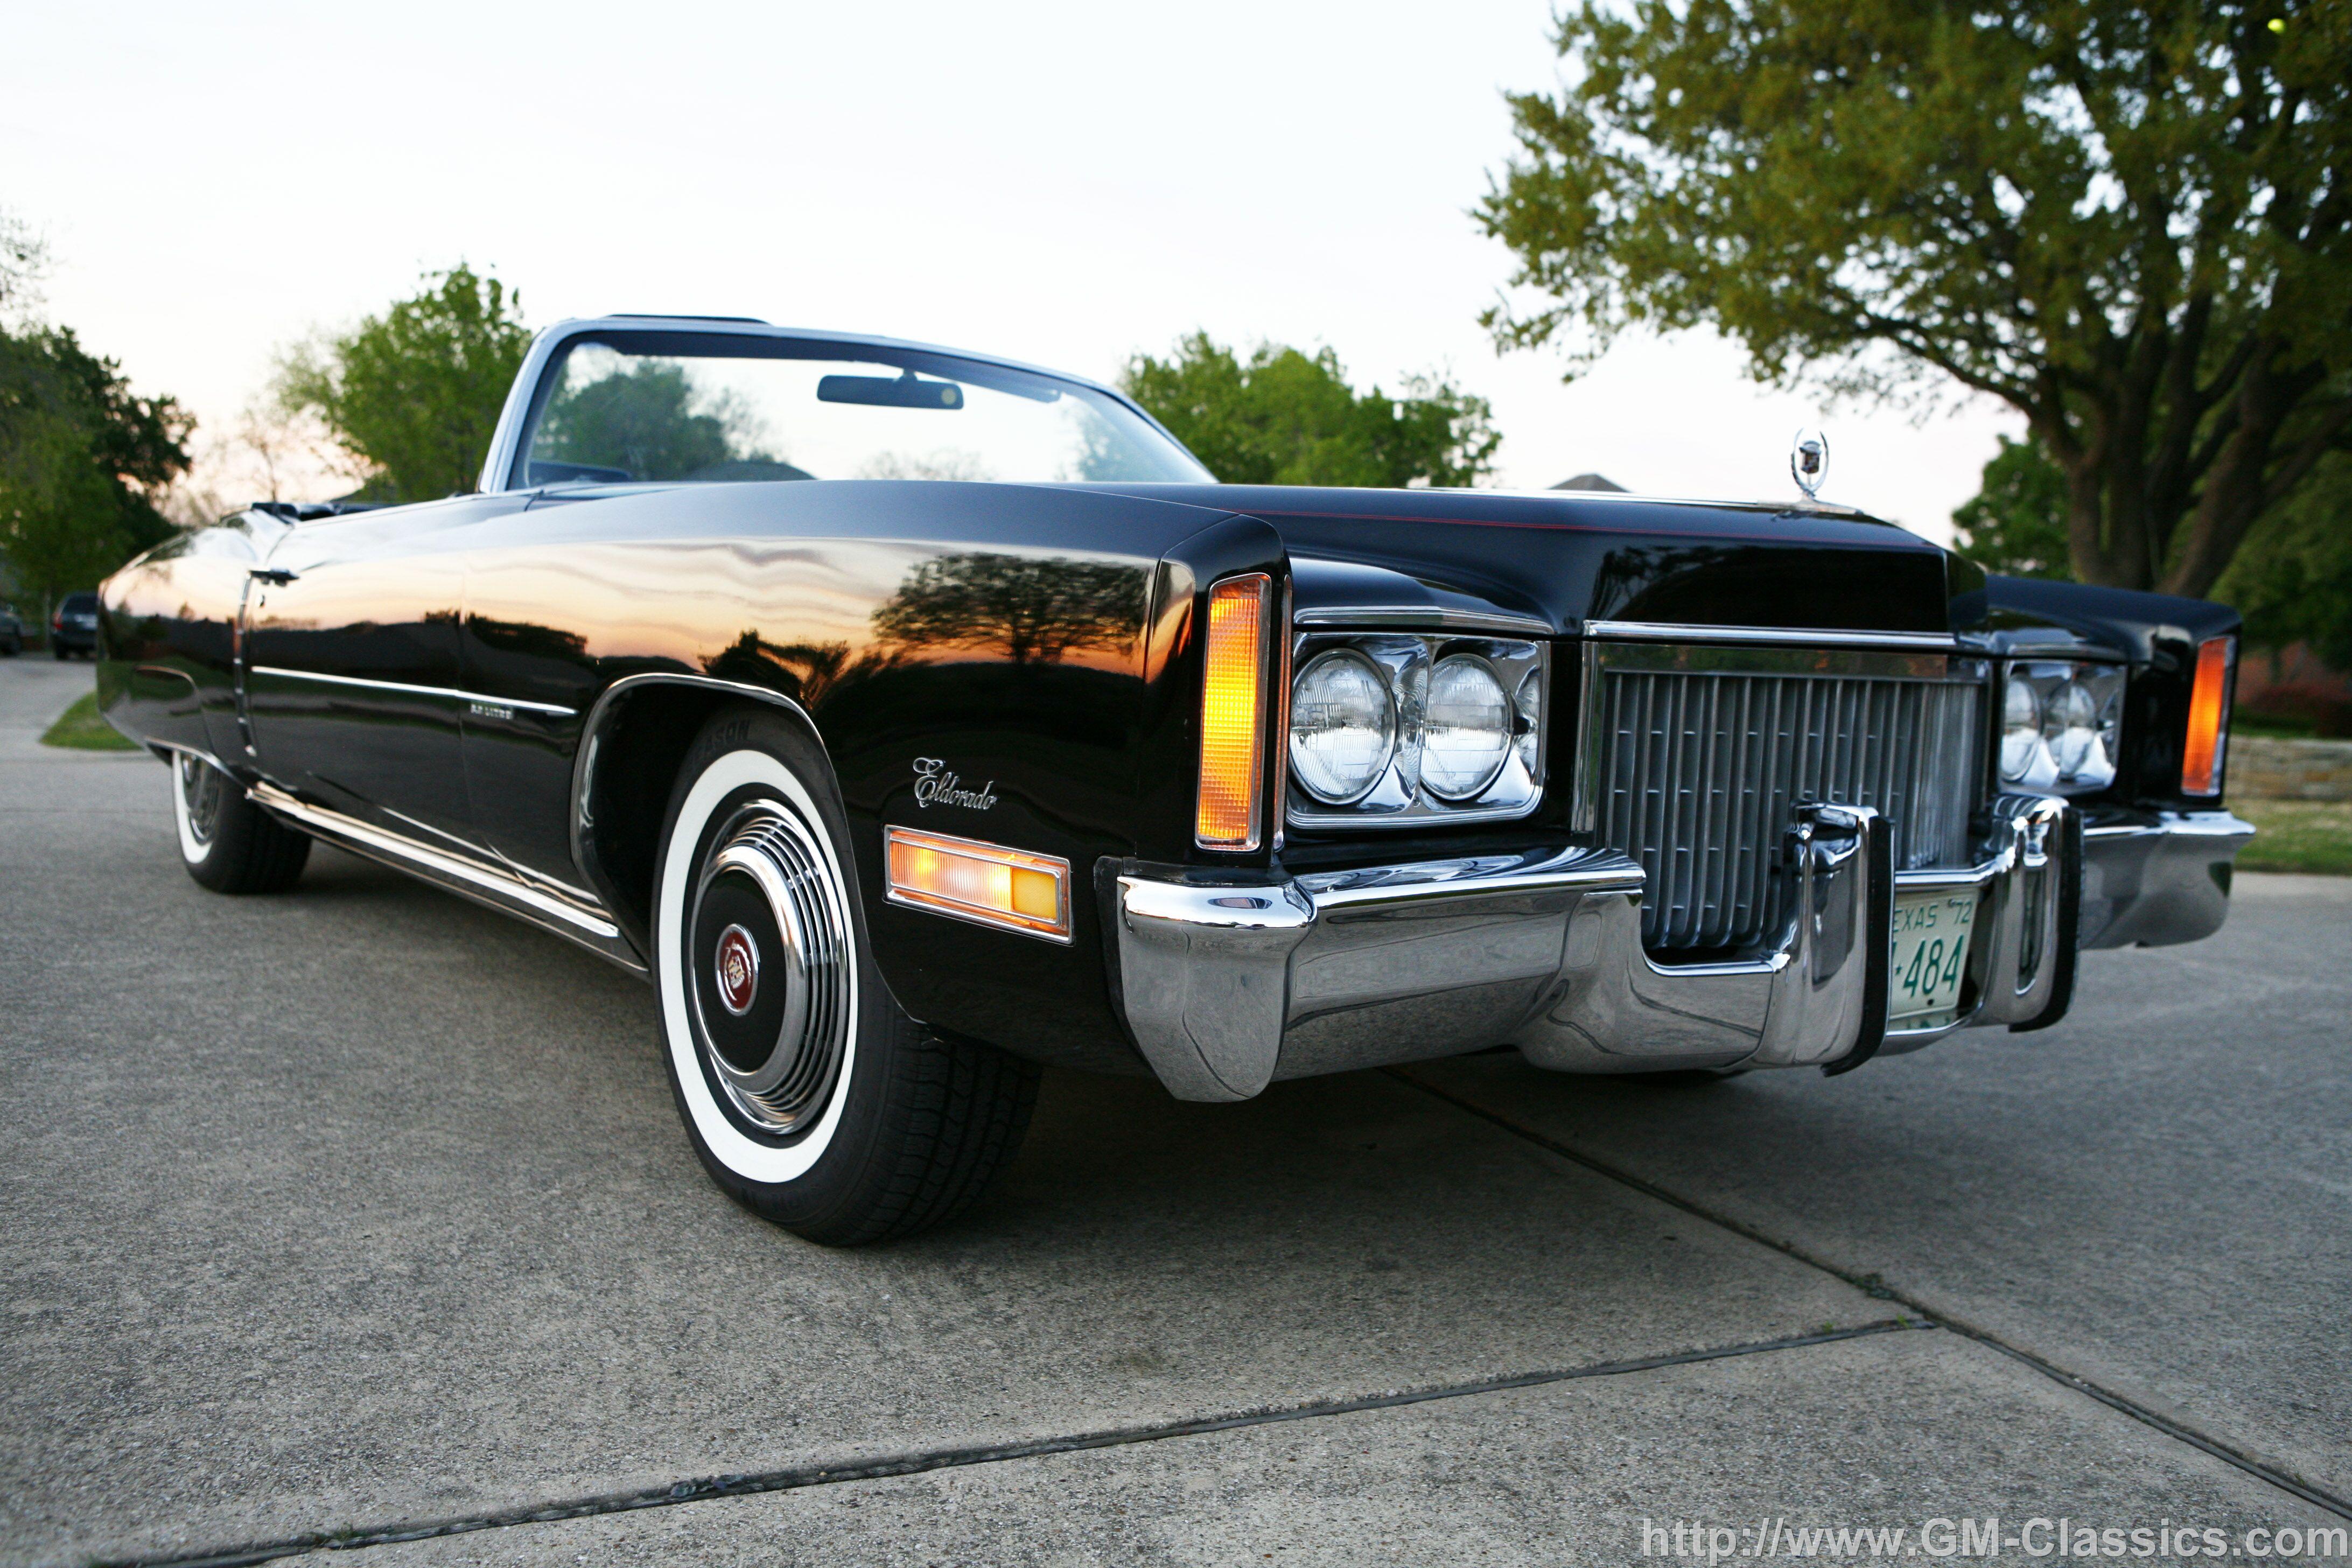 Worksheet. 1972 Cadillac Eldorado Convertible  Matt Garrett